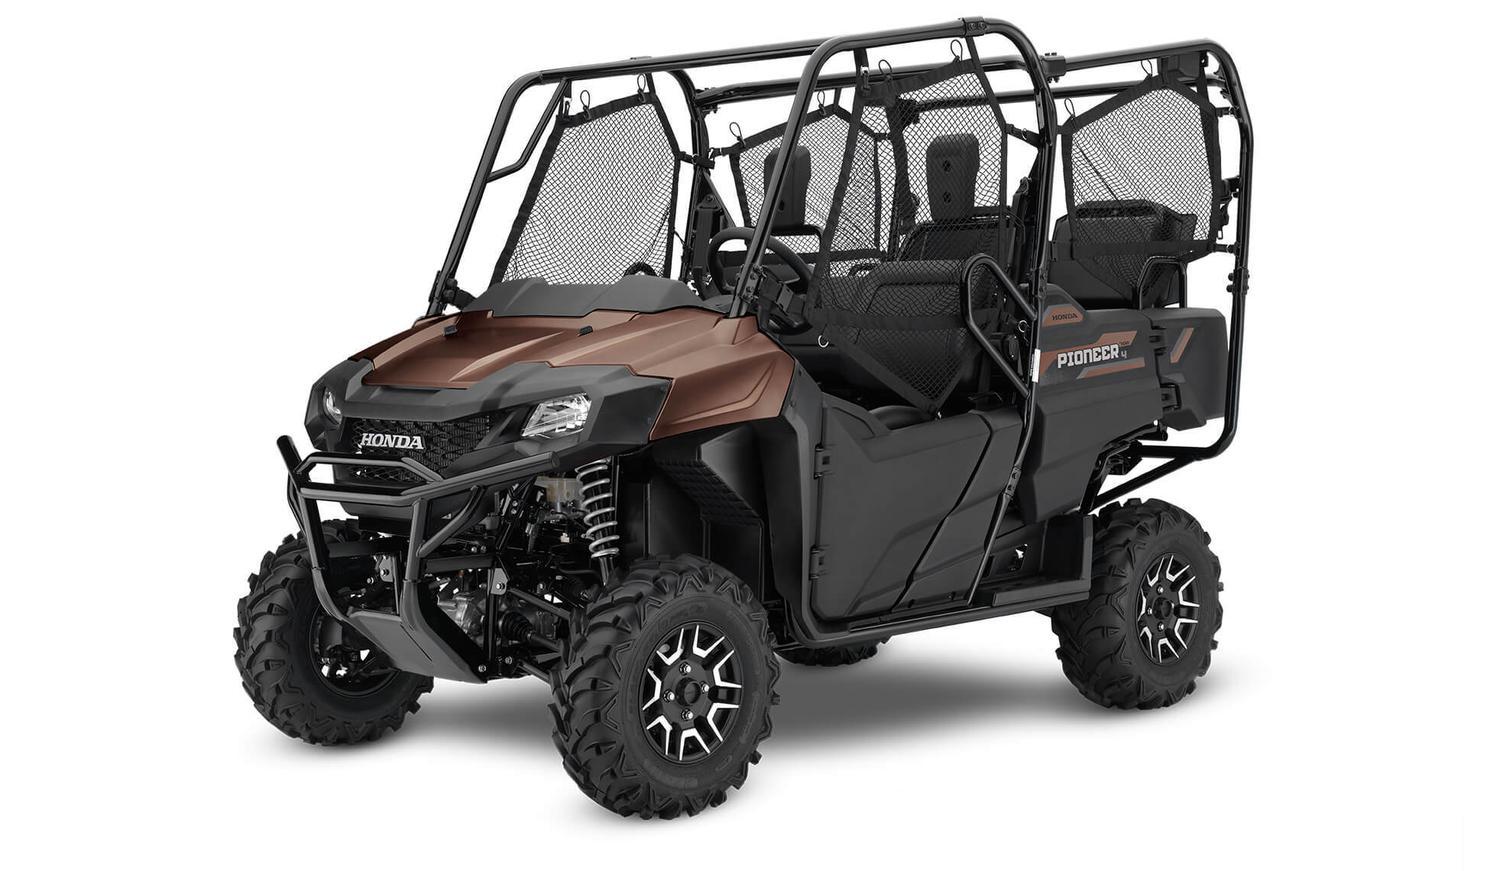 2021 Honda Pioneer 700-4 Deluxe Frais inclus+Taxes